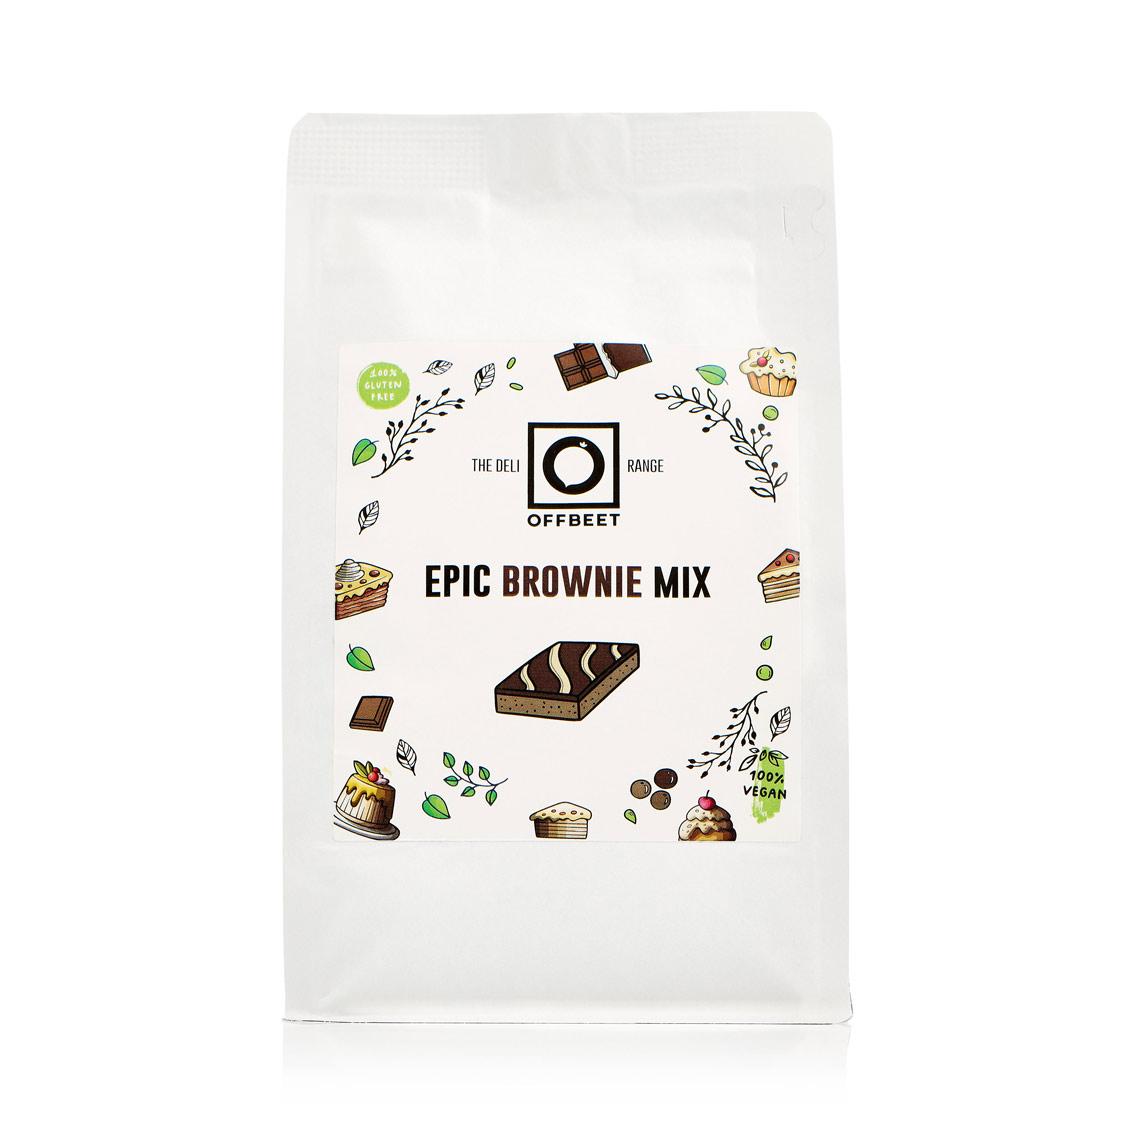 Epic vegan brownie mix